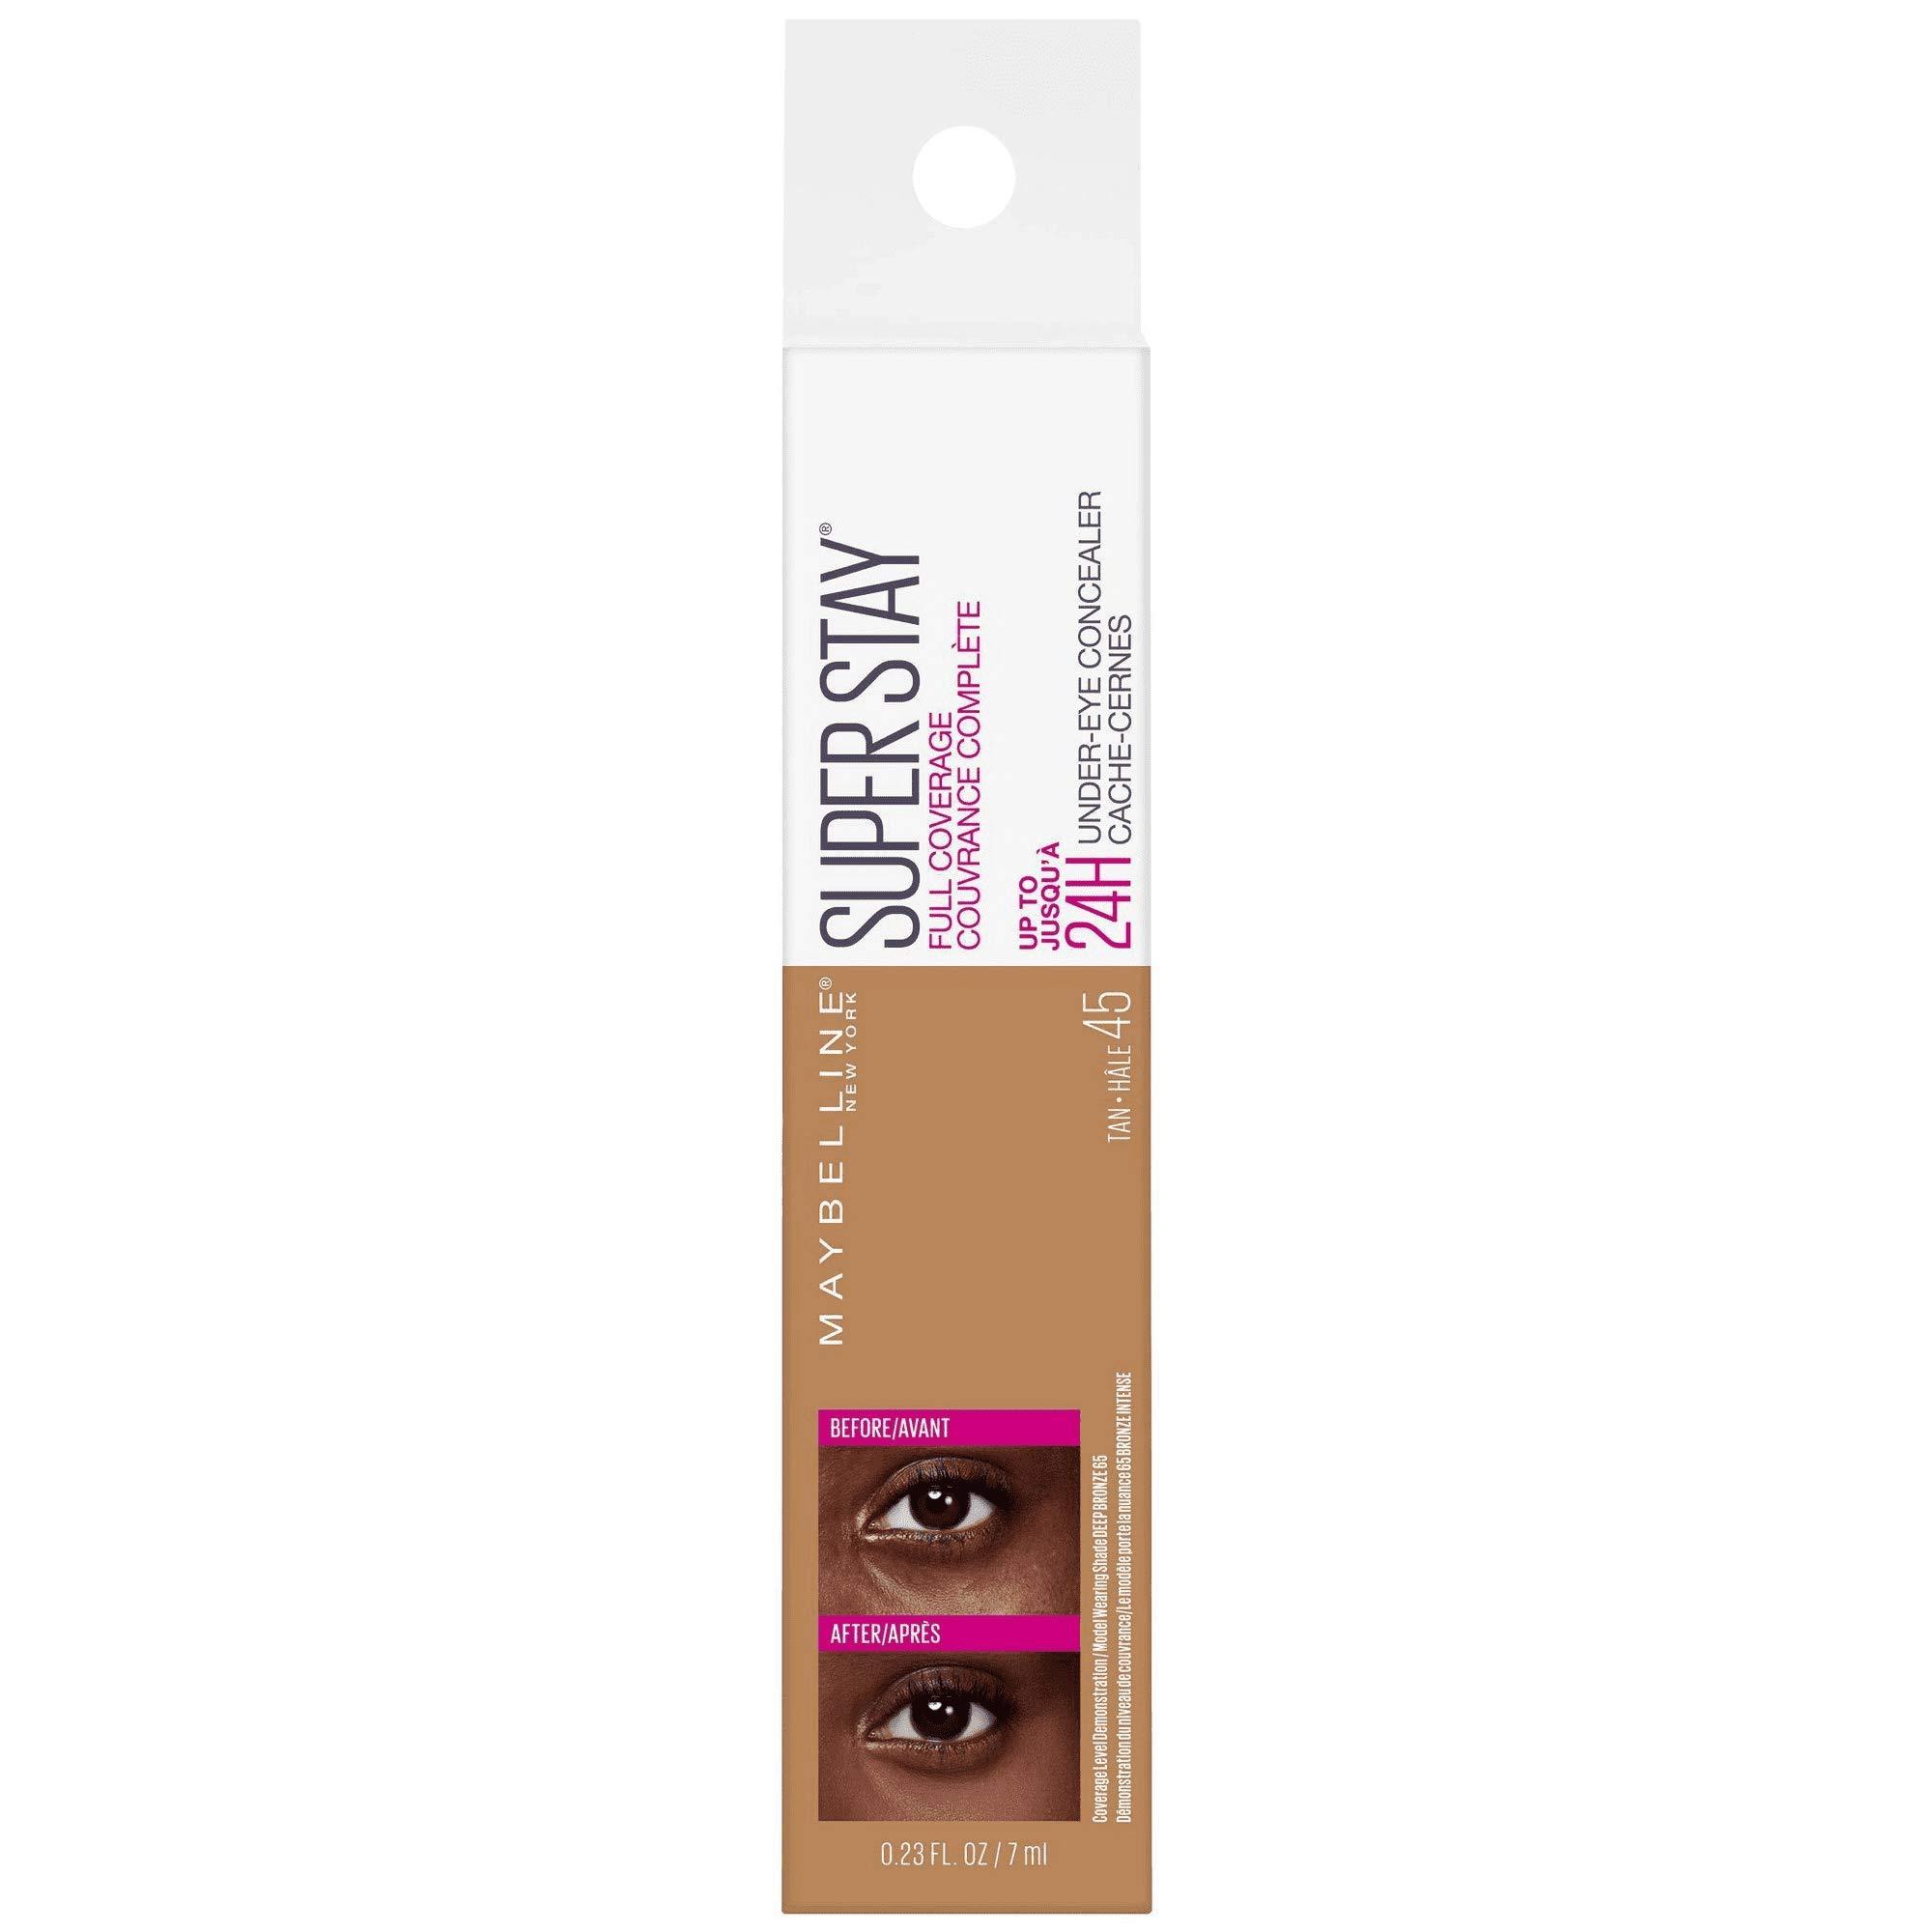 Super Stay Full Coverage Long Lasting Under-Eye Concealer, 45 Tan, 0.23 fl oz (Pack of 2)